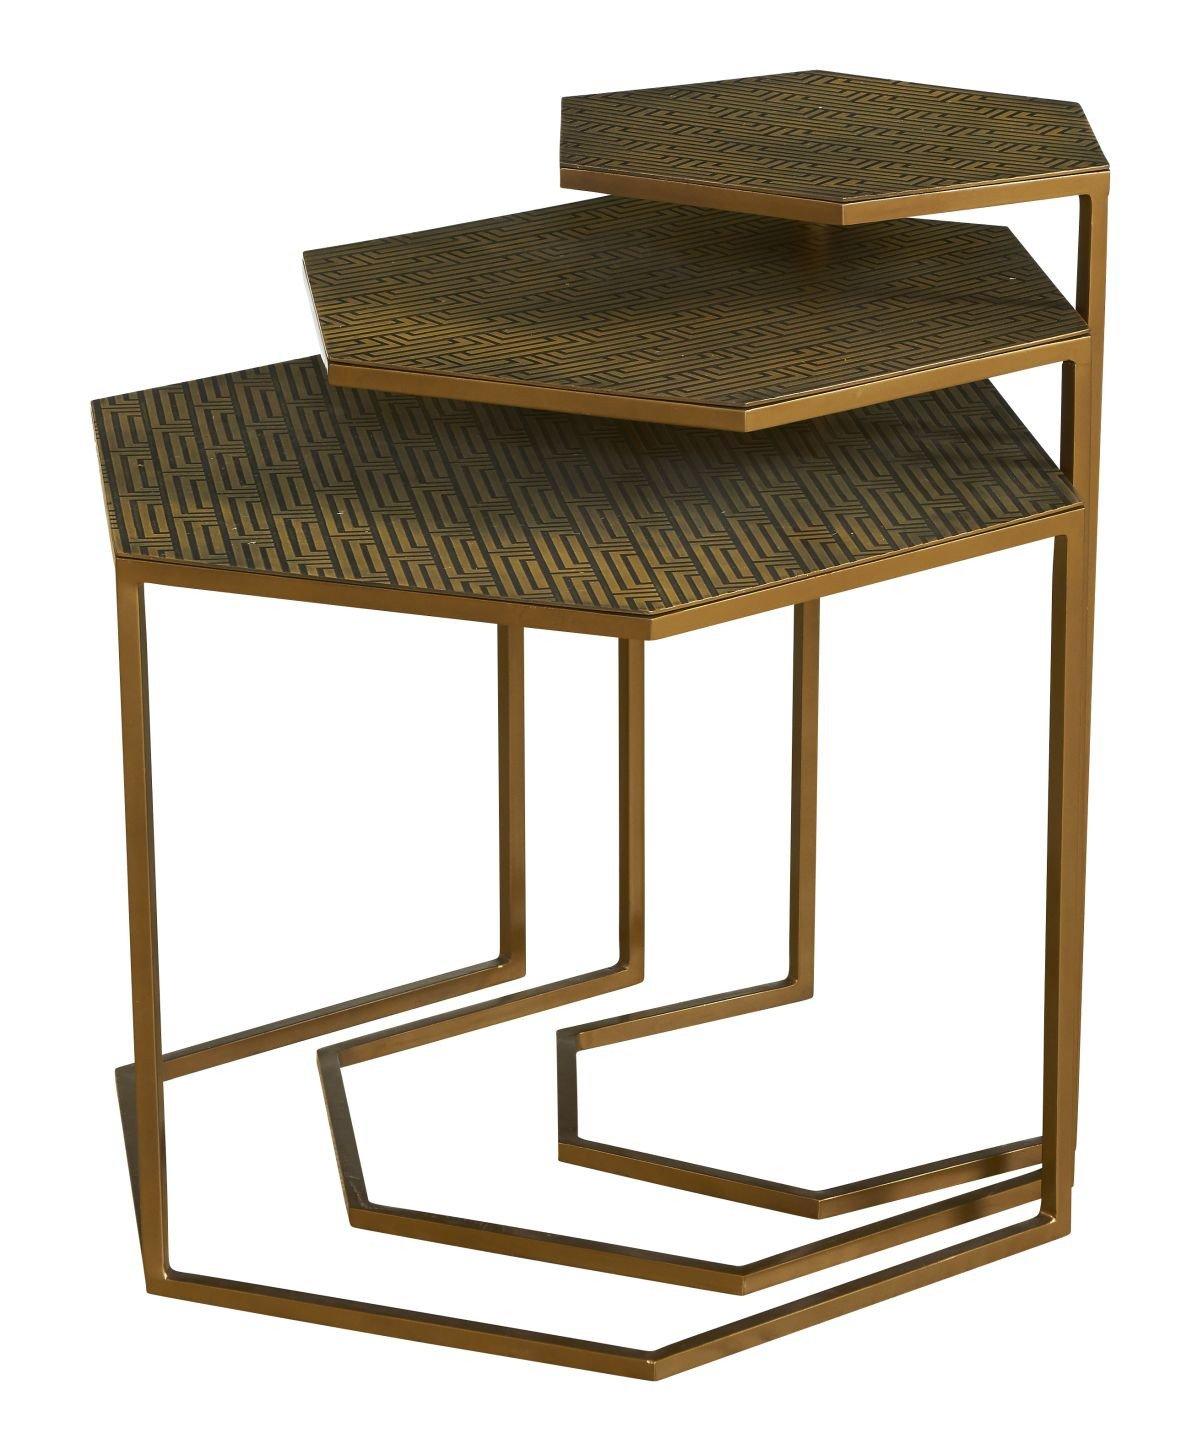 Sydney Mod STEPS Table Series designed by Florence Broadhurst